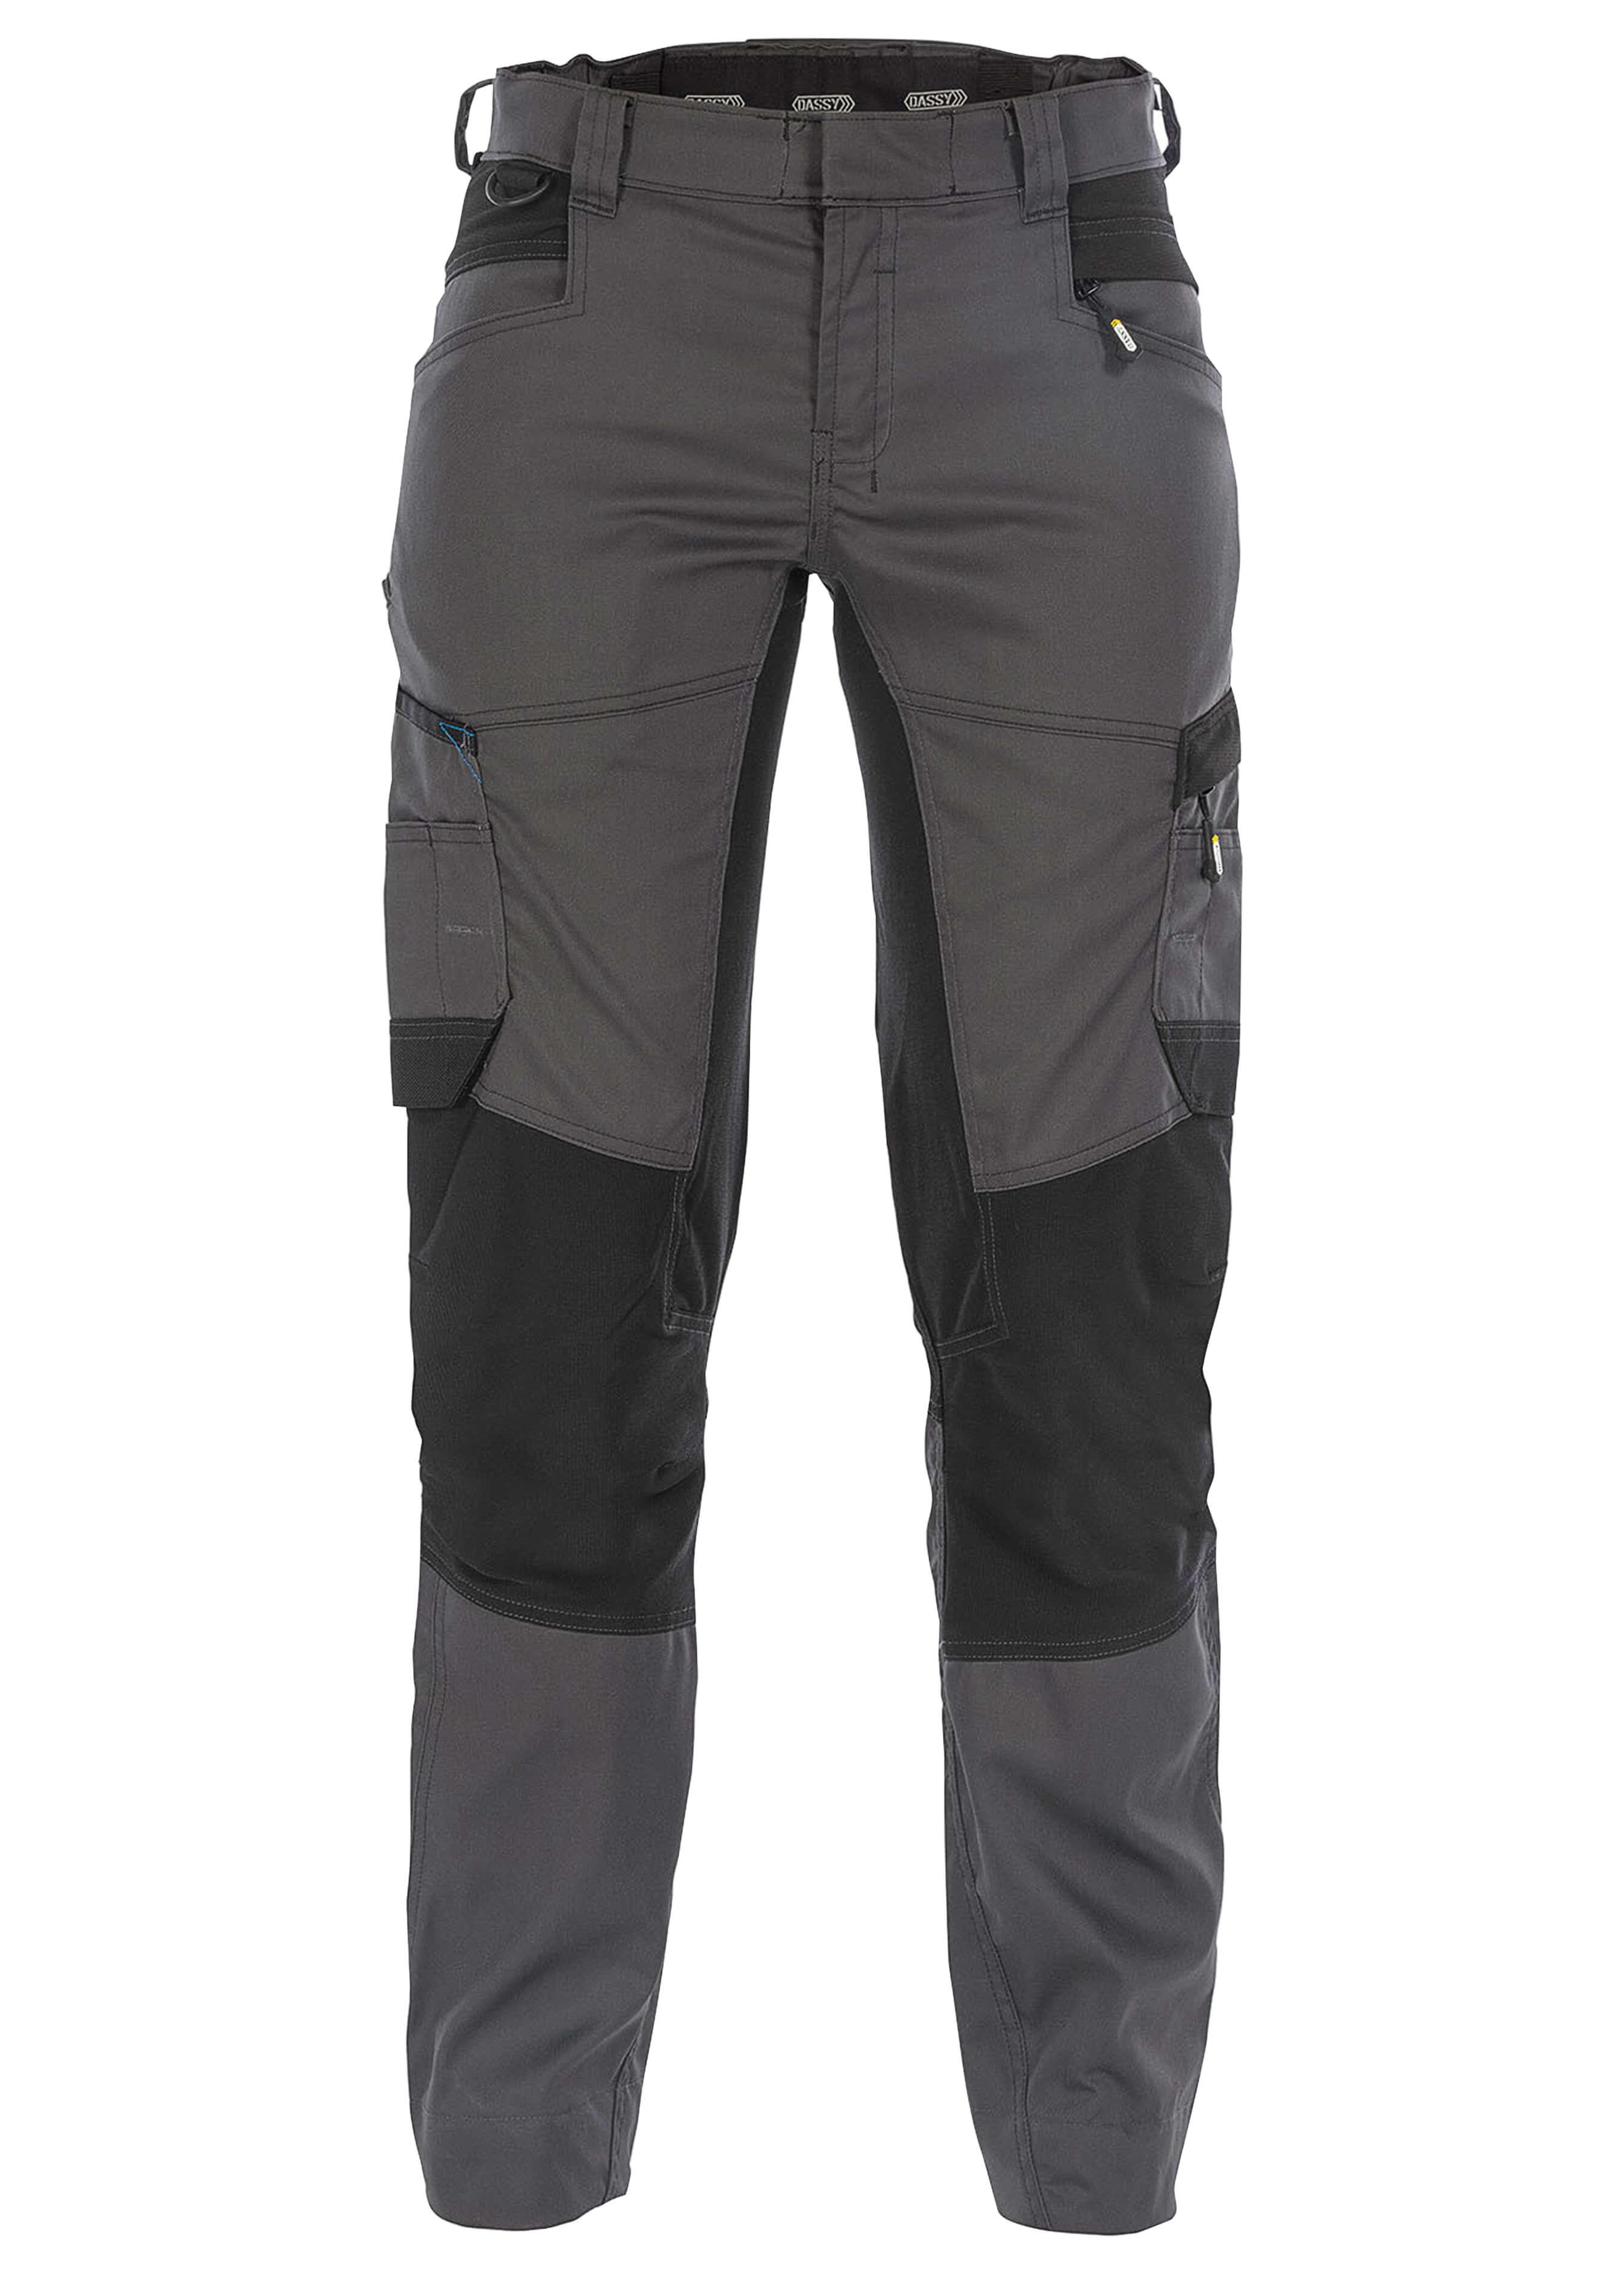 pantalon de travail stretch pour dames Helix 26431236 1